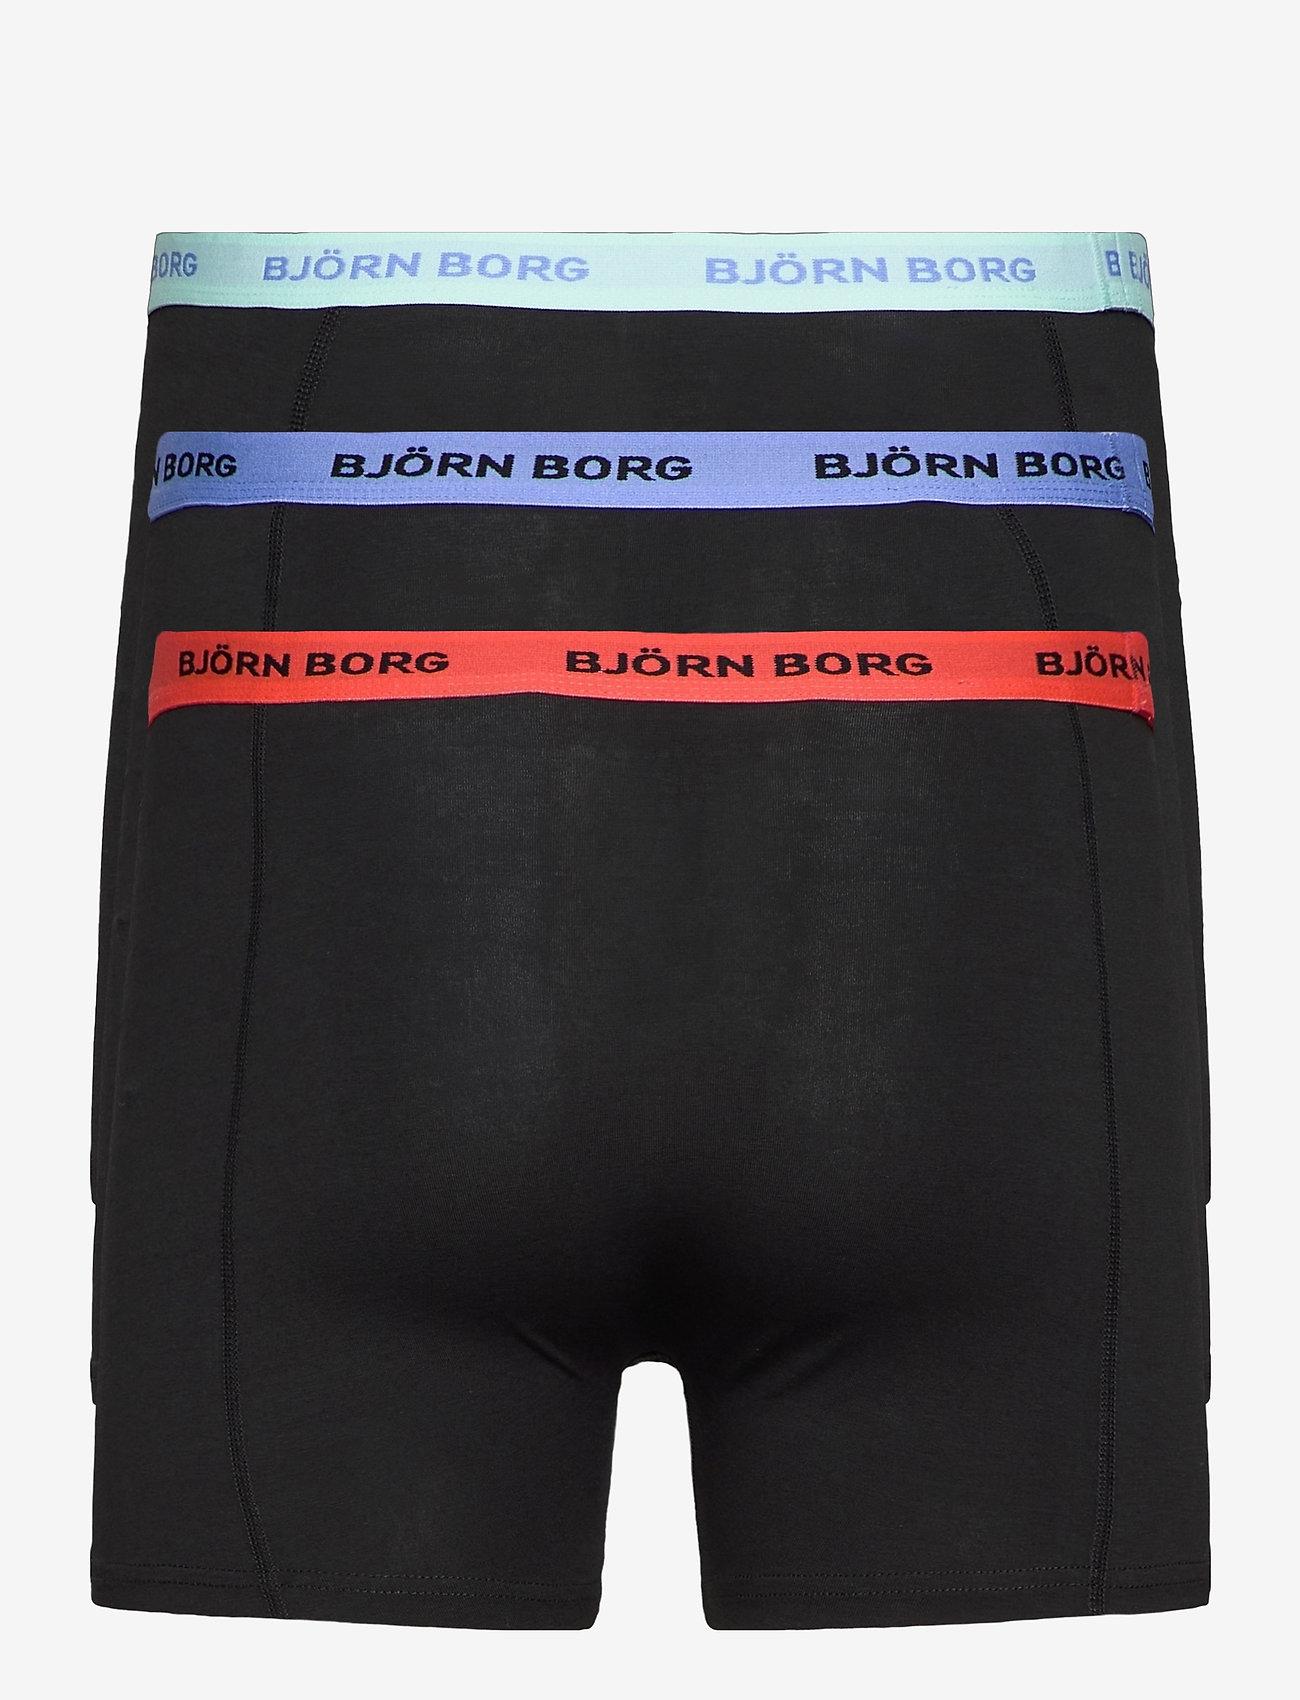 Björn Borg - SHORTS SAMMY SOLID MULTI - underwear - black beauty - 1